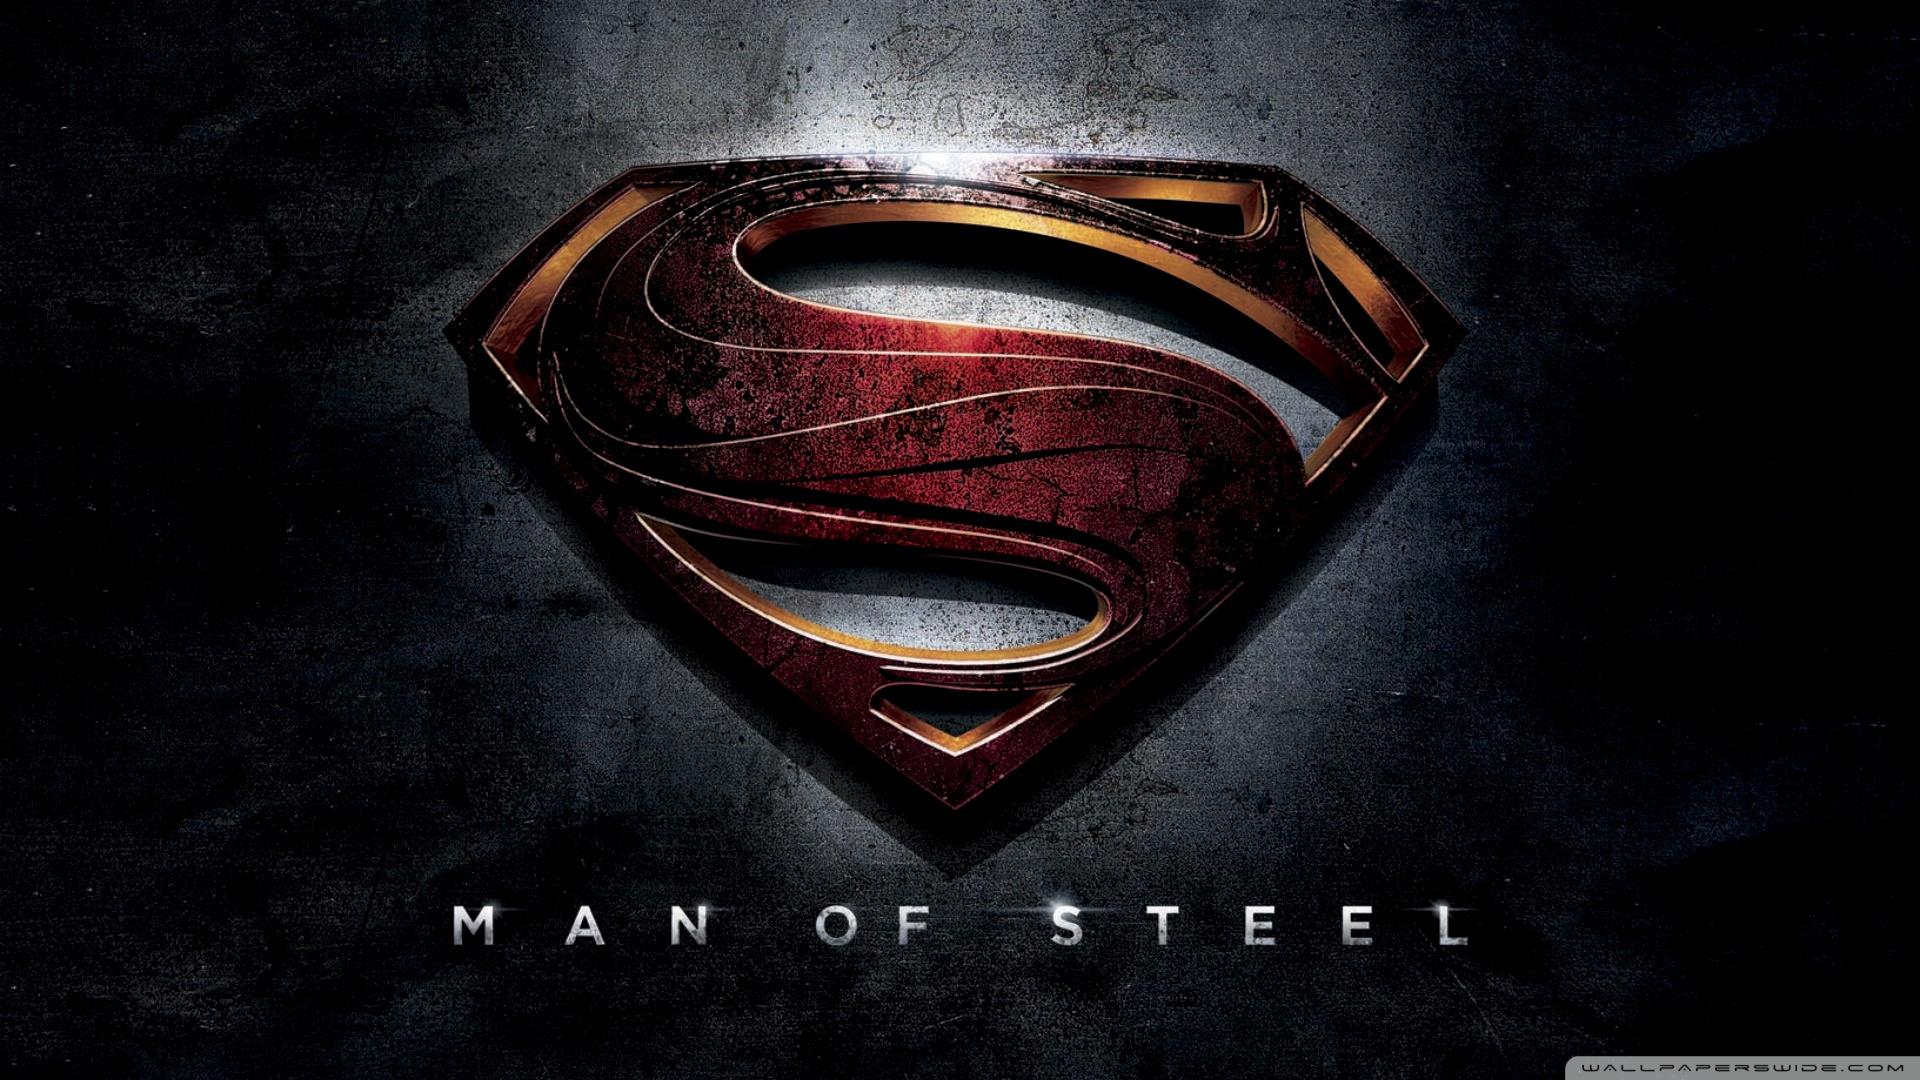 Man Of Steel 2013 Wallpaper 1920x1080 Man Of Steel 2013 1920x1080